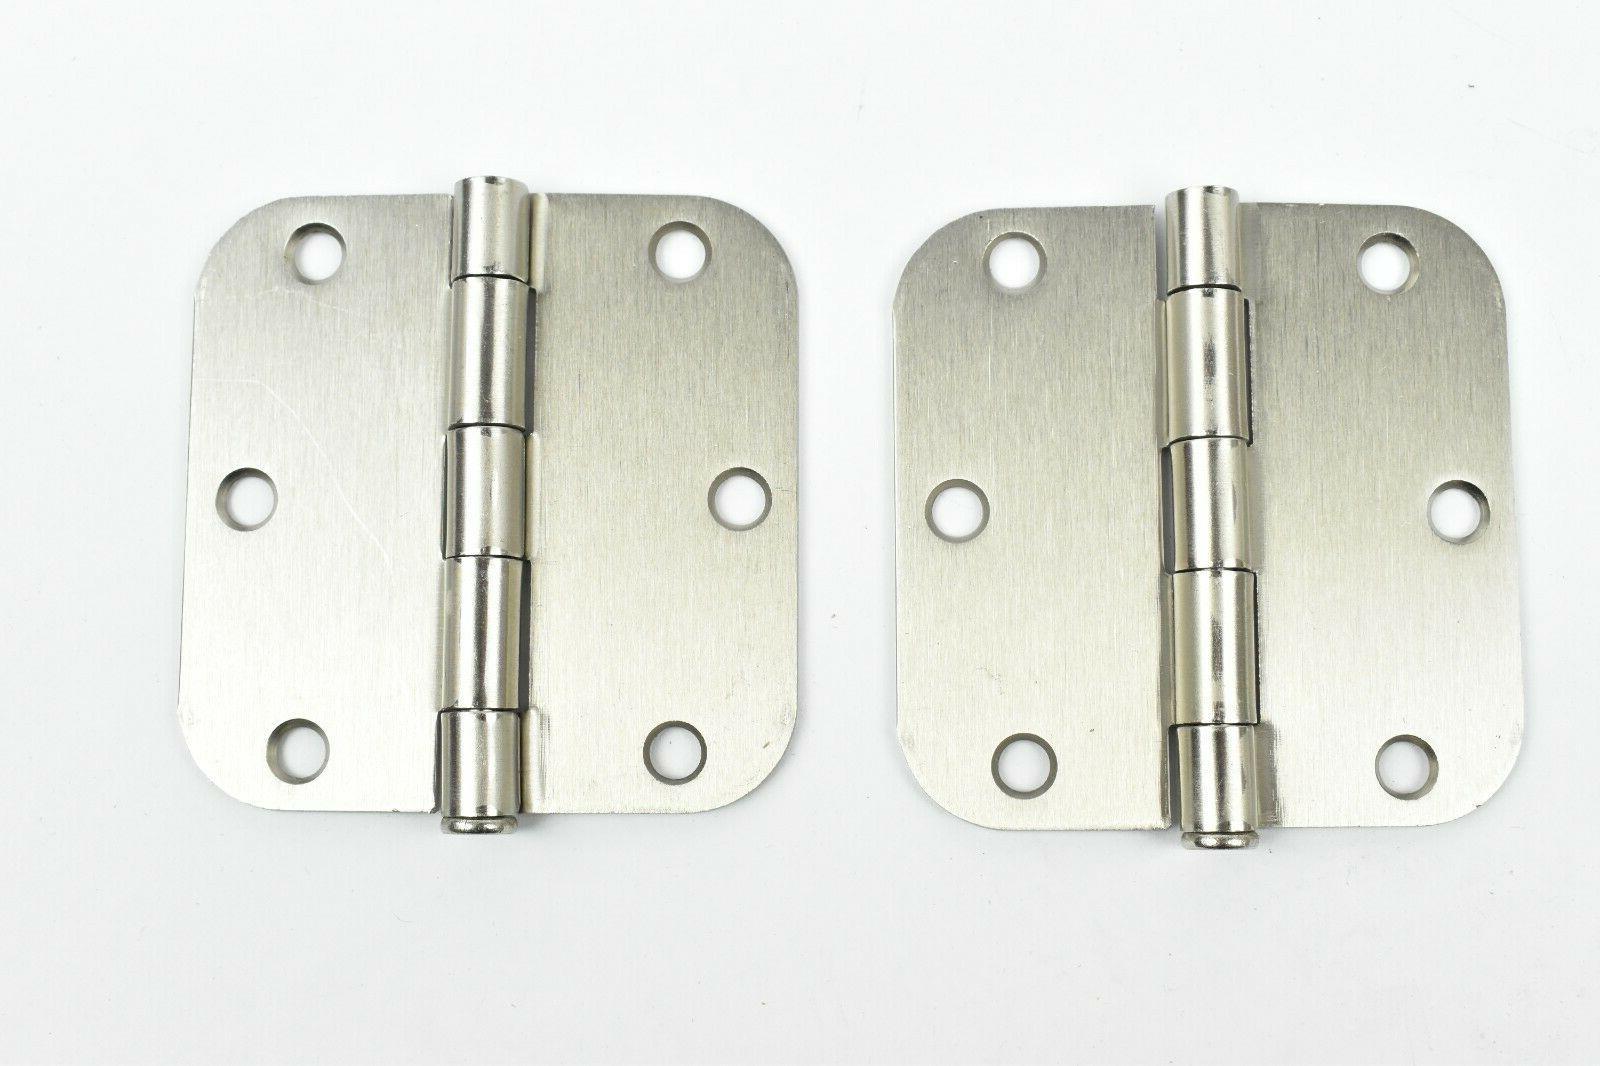 2 Satin Nickel X radius brushed nickel Interior Door Hinges